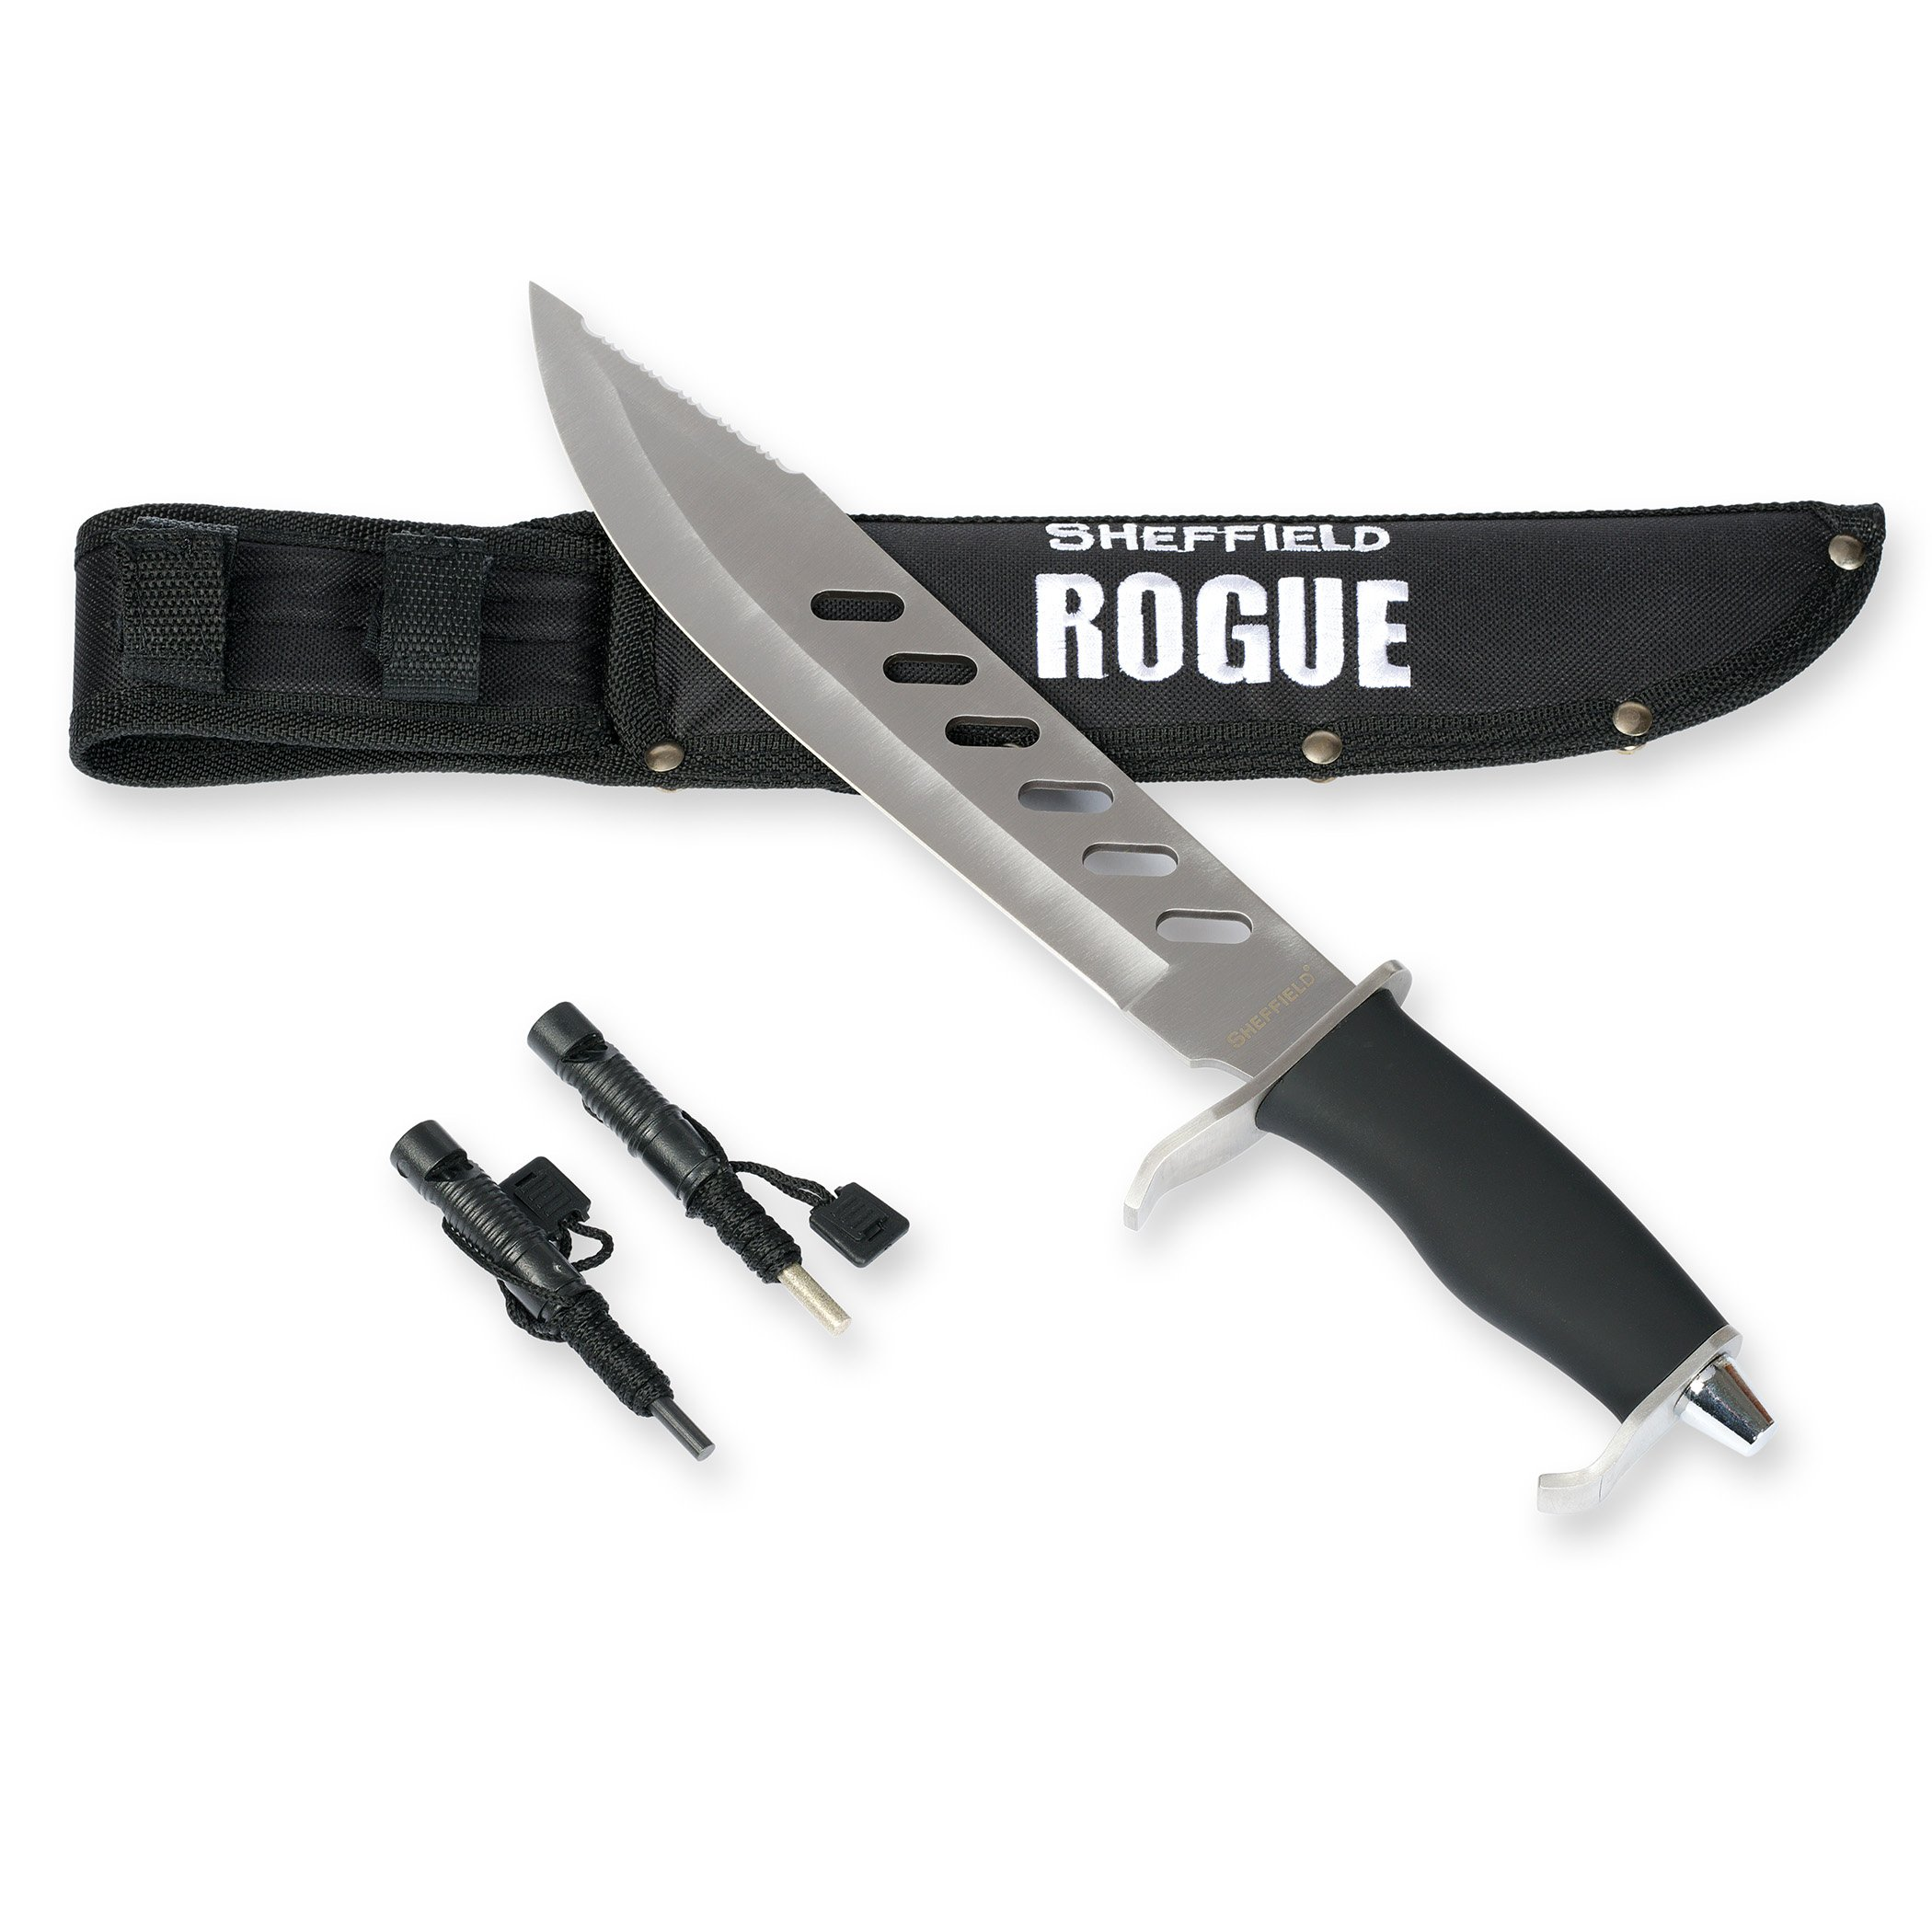 SHEFFIELD Rogue 10-inch Fixed Blade Hunting Knife W/ Bonus Sheath Firestarter Sharpener